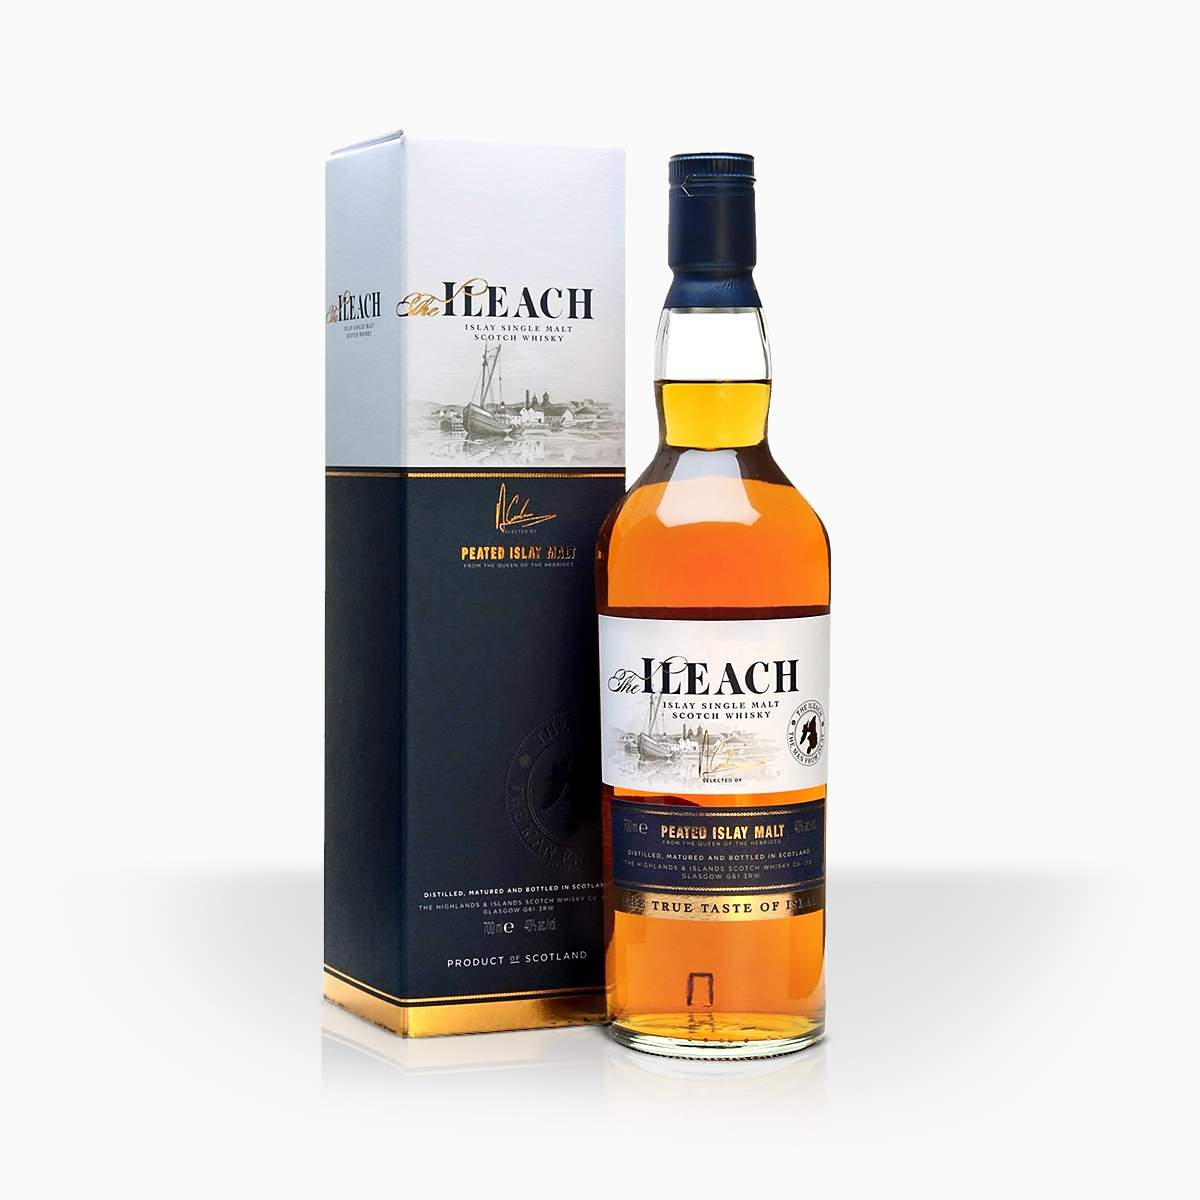 Whisky The Ileach 40% 0,7l